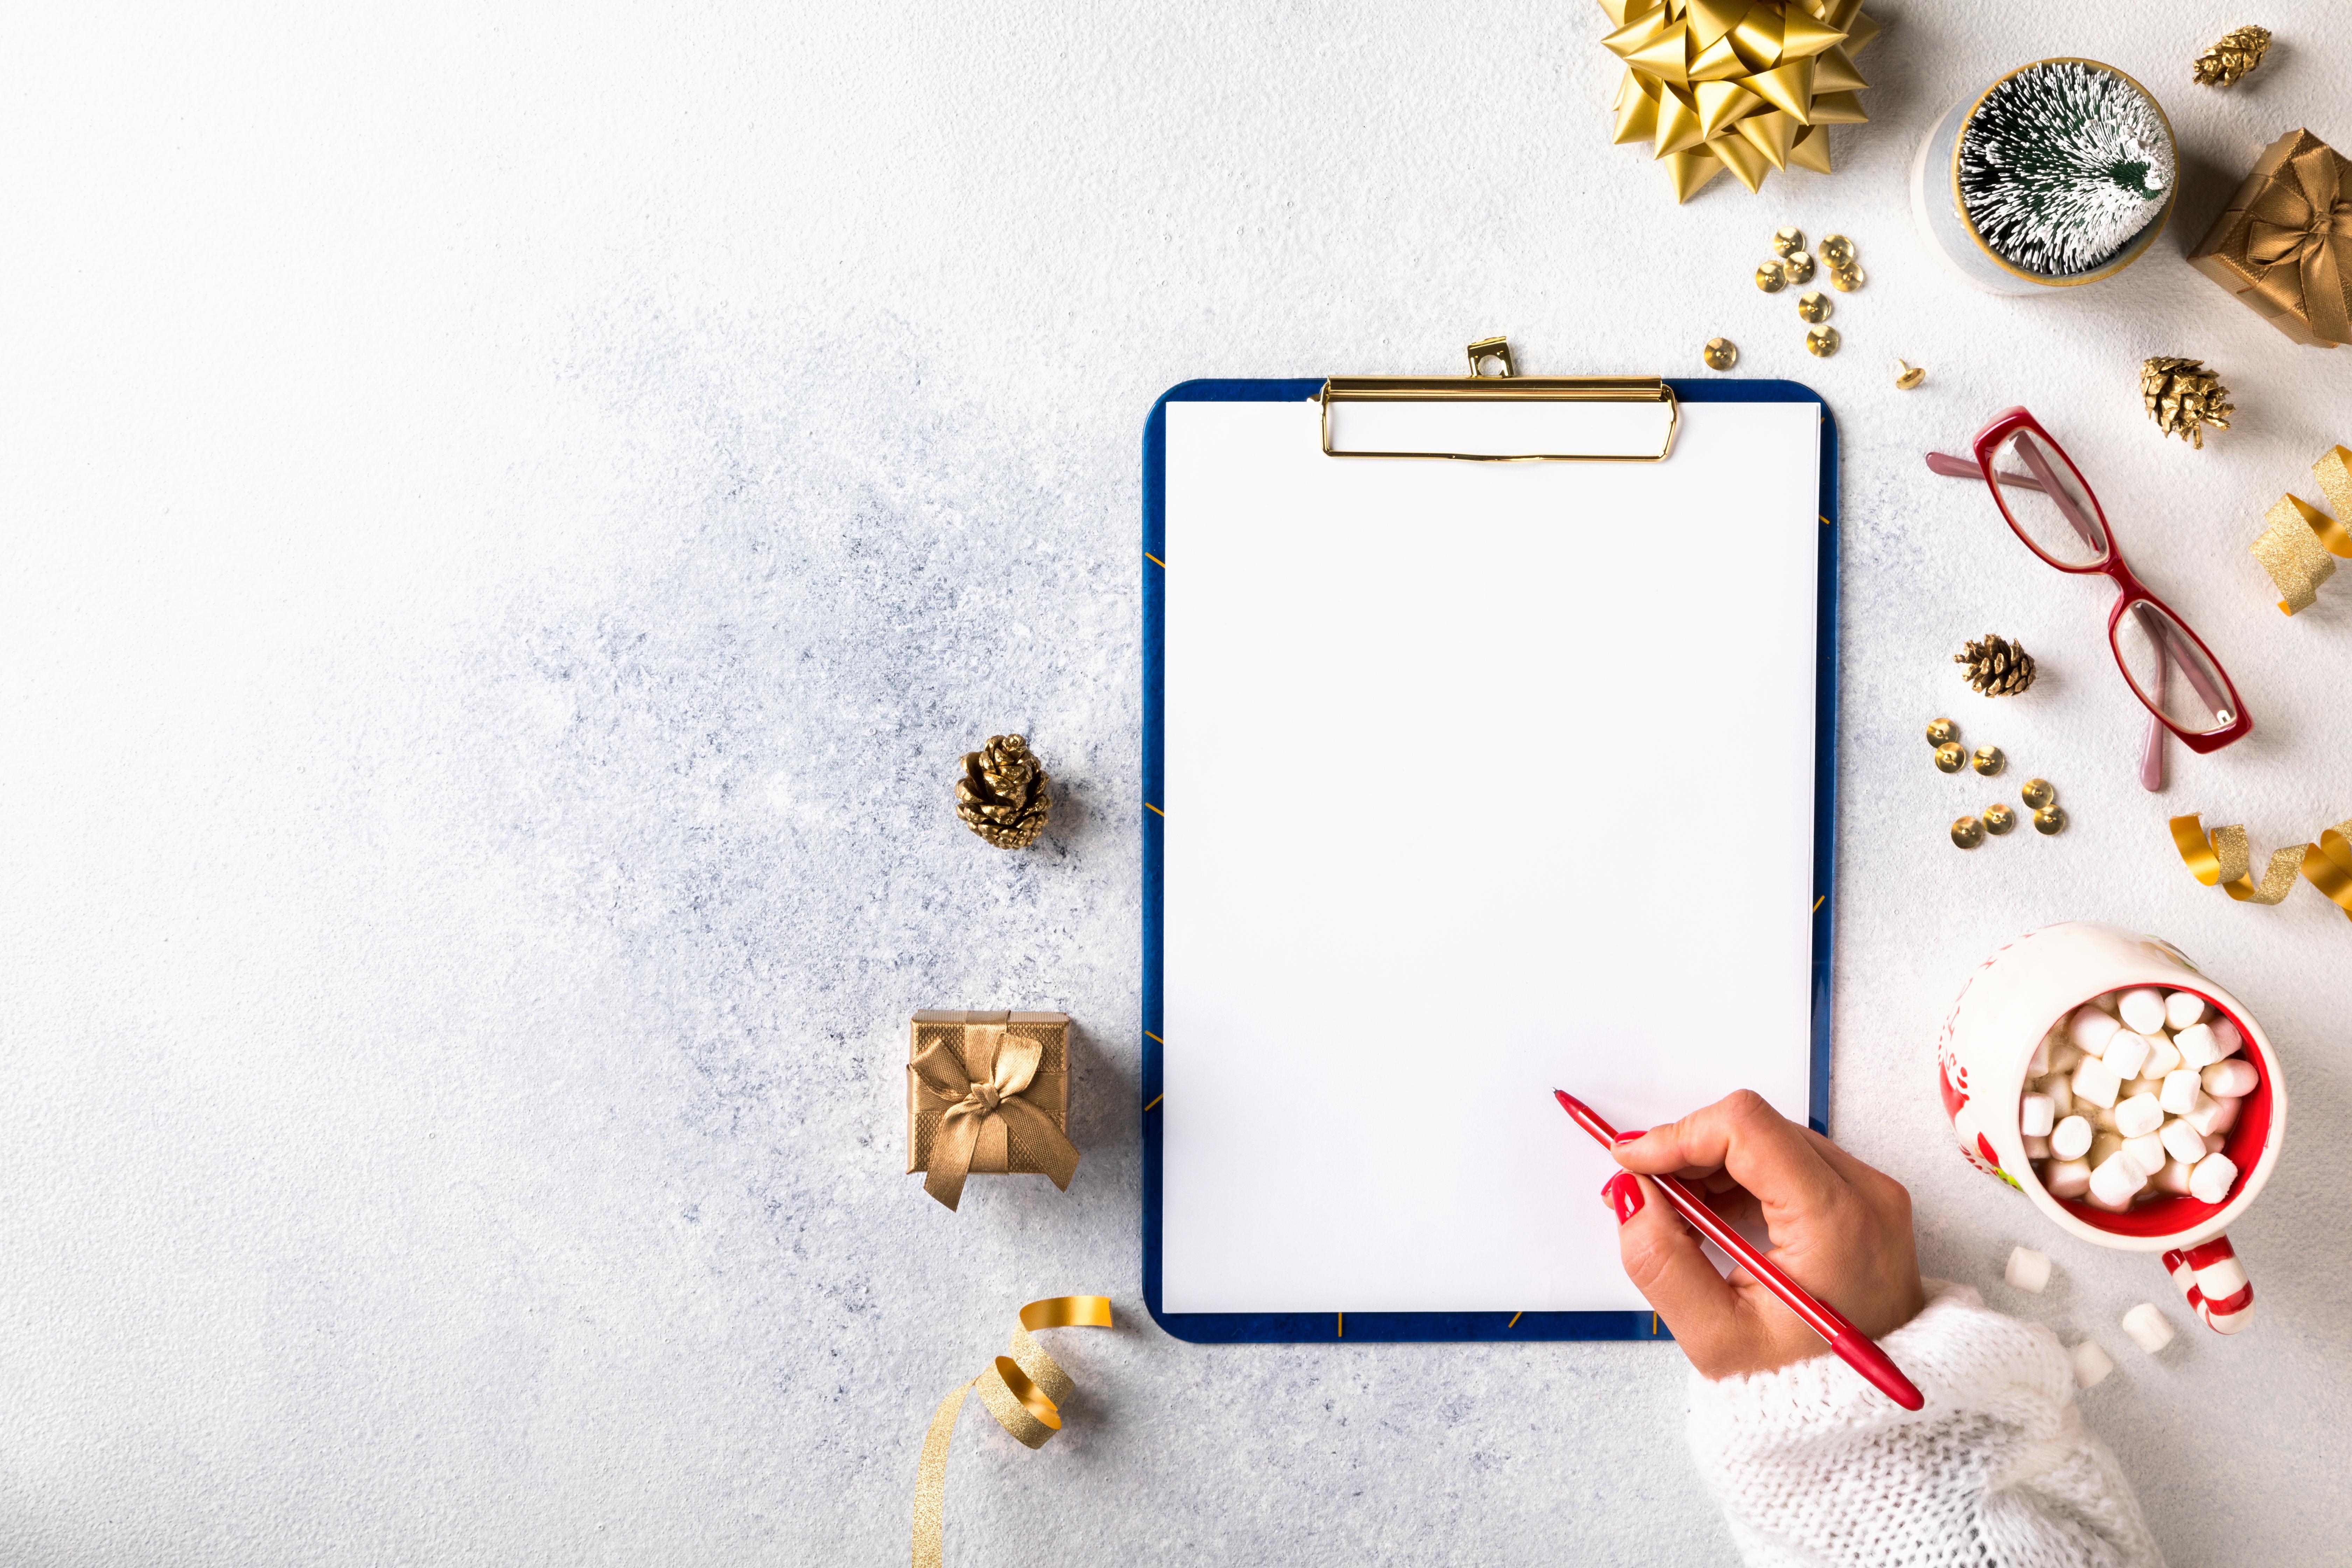 new-year-goals-plans-action-business-motivation-CVHGJ84